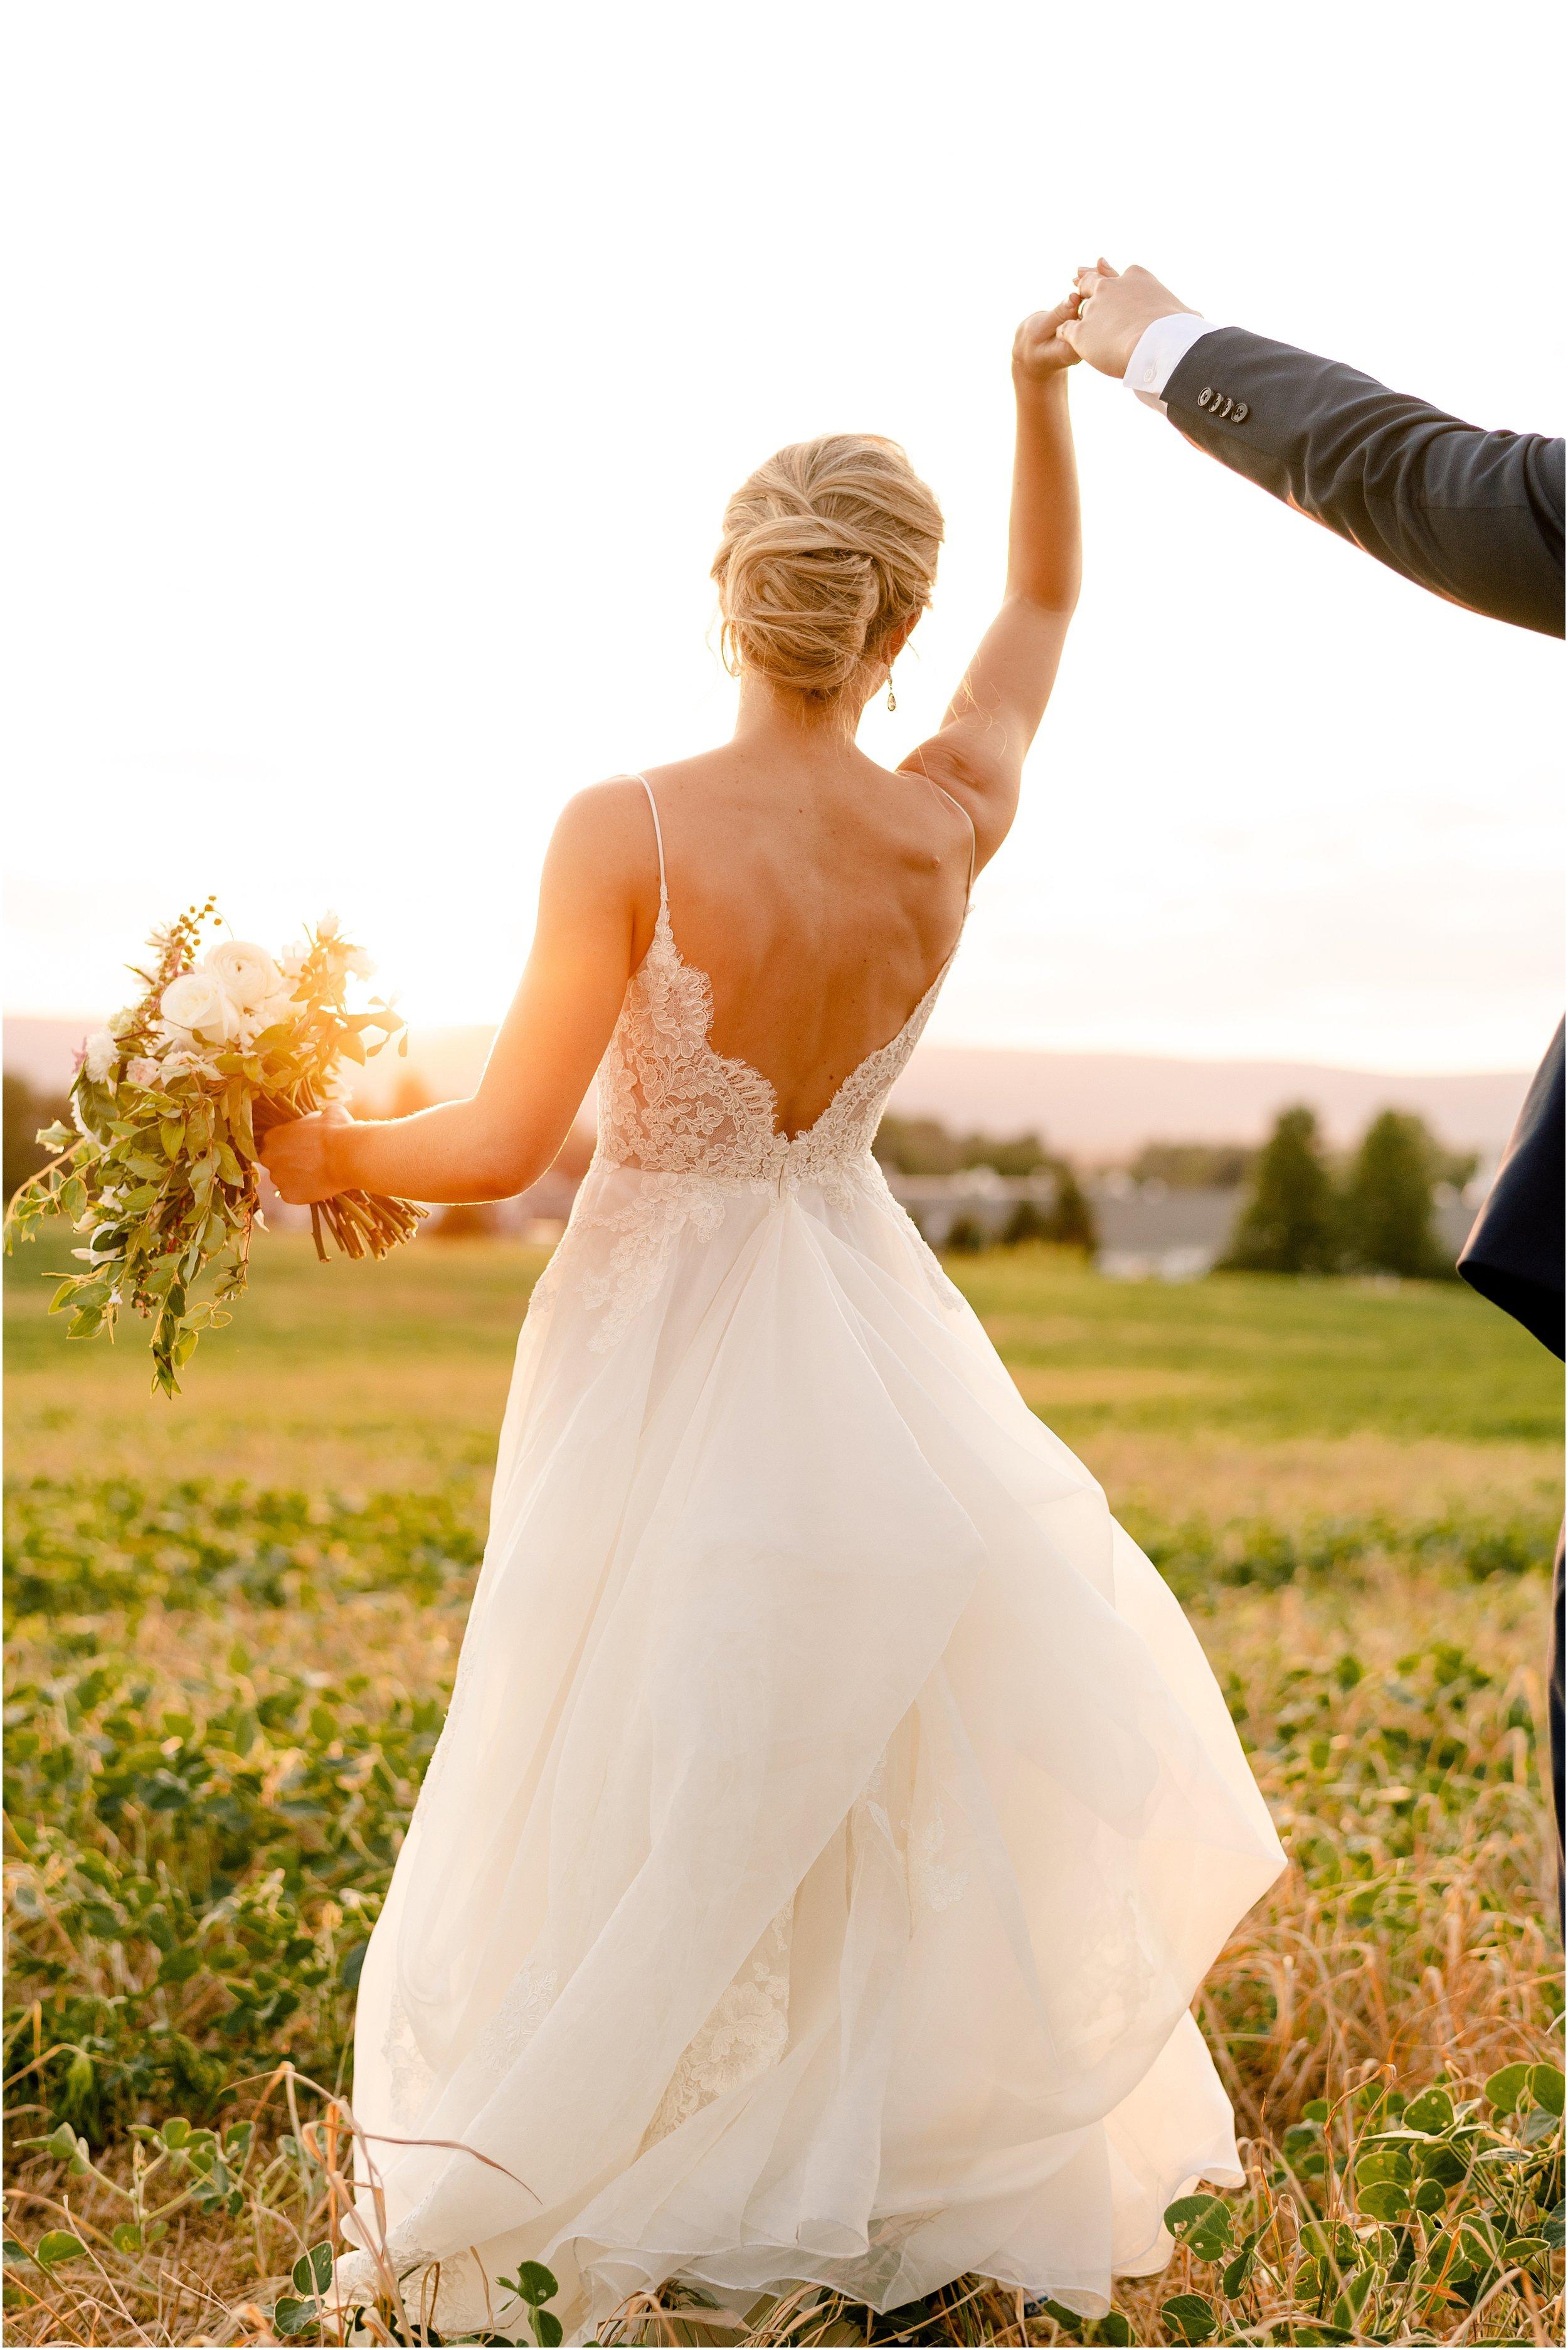 hannah leigh photography Walkers Overlook Wedding Walkersville MD_3563.jpg